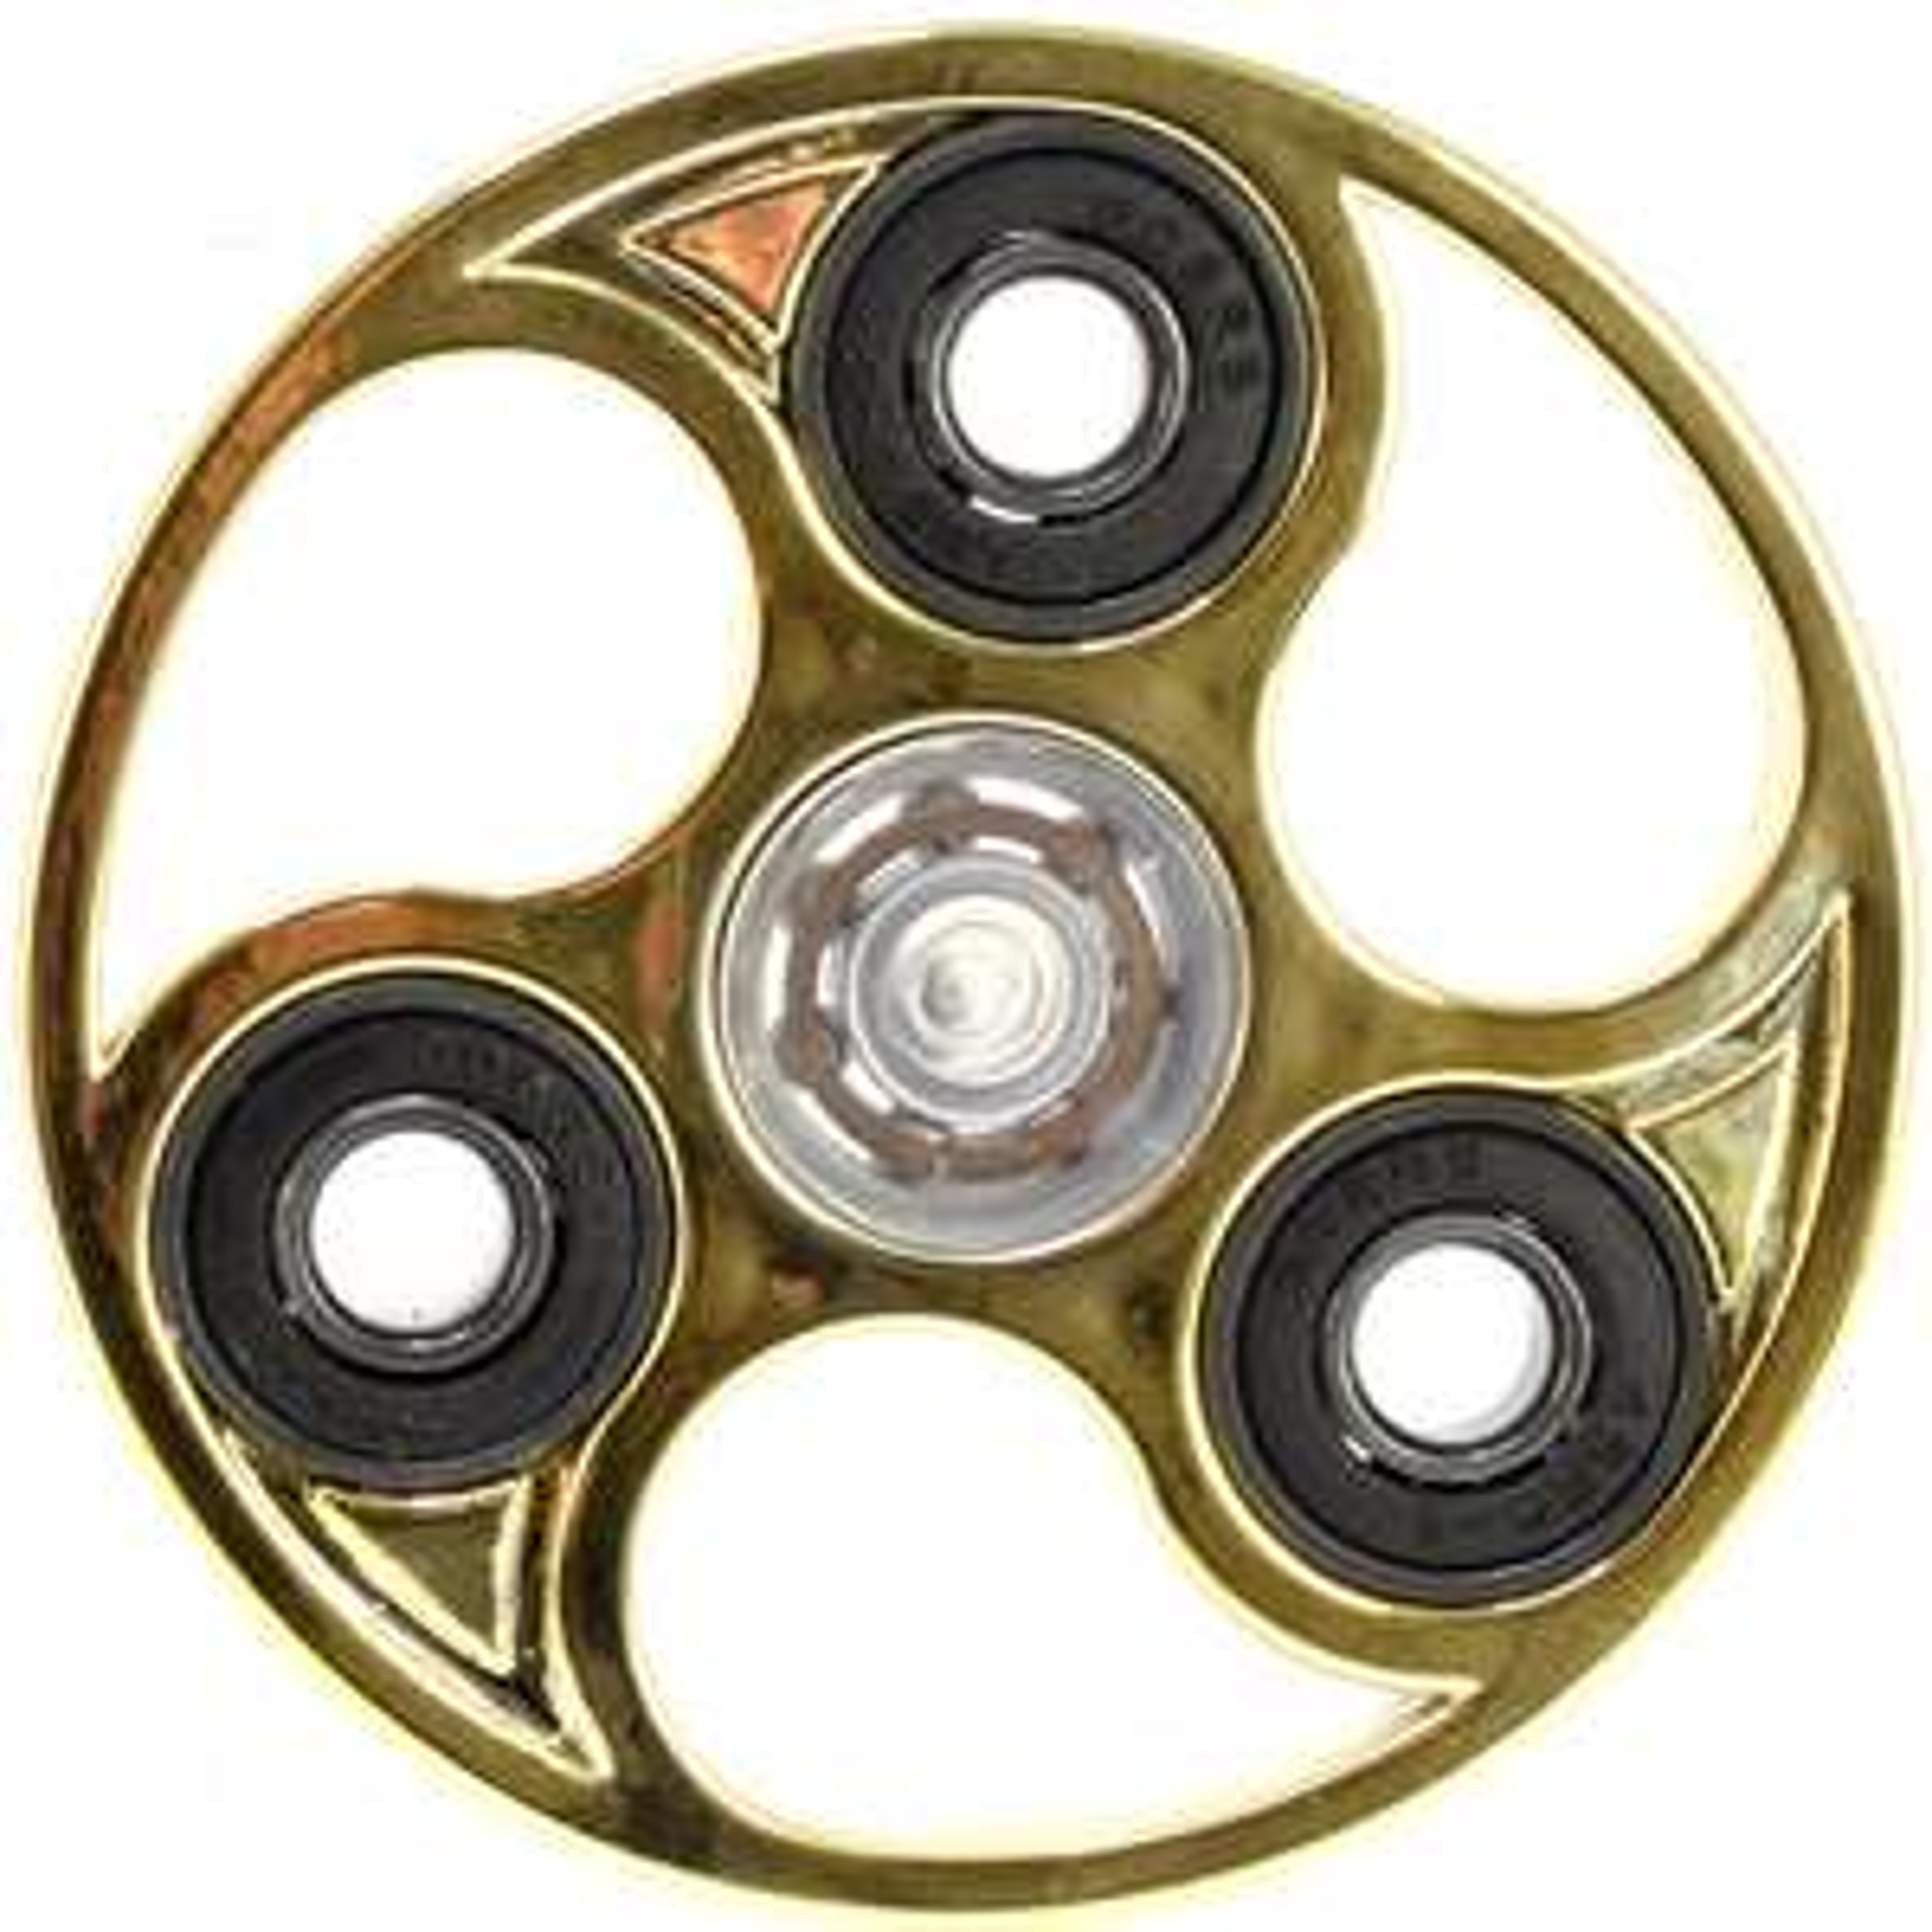 Nimm 3 Zahl 2 Fidget Spinner